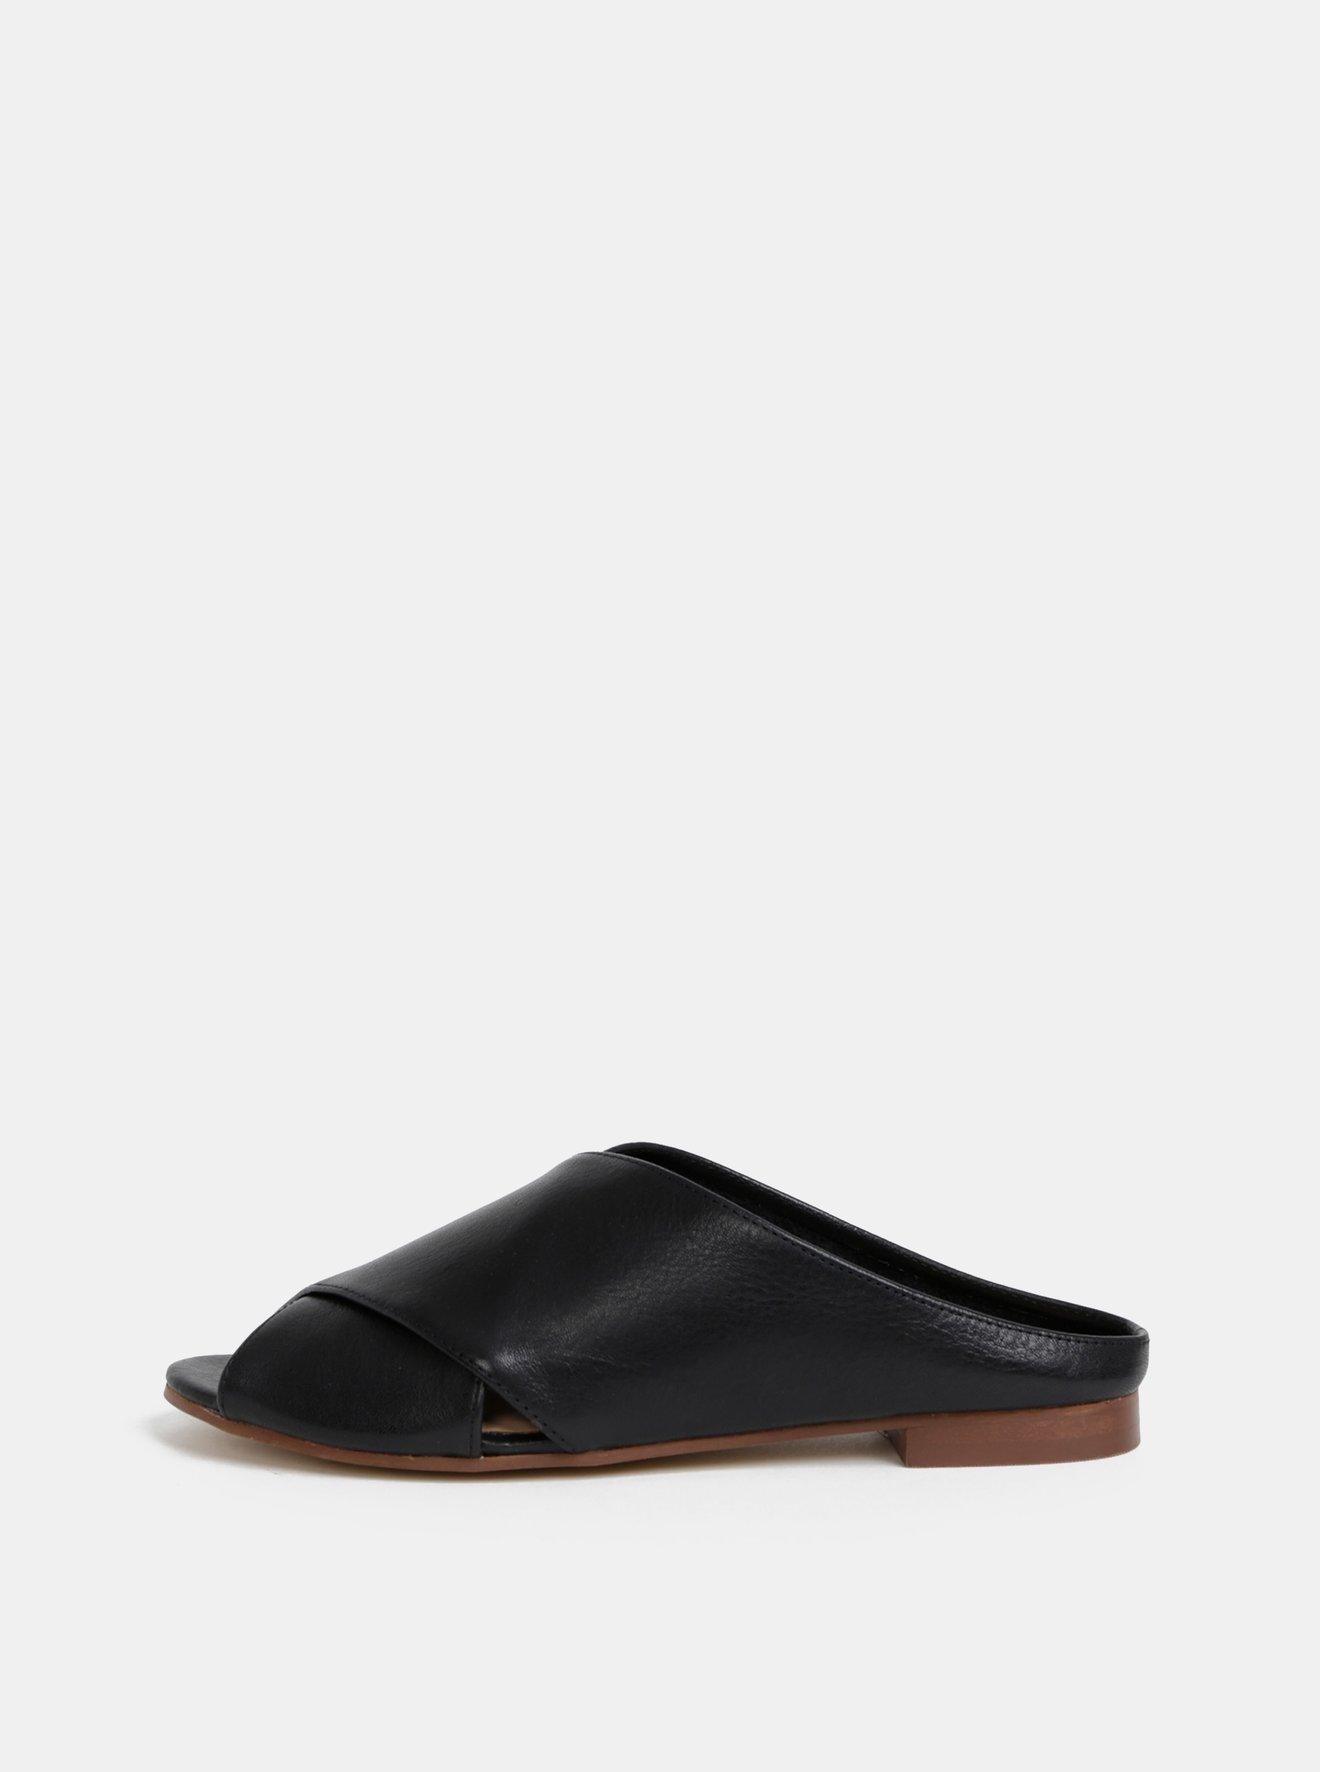 Černé dámské kožené pantofle ALDO Rireviel